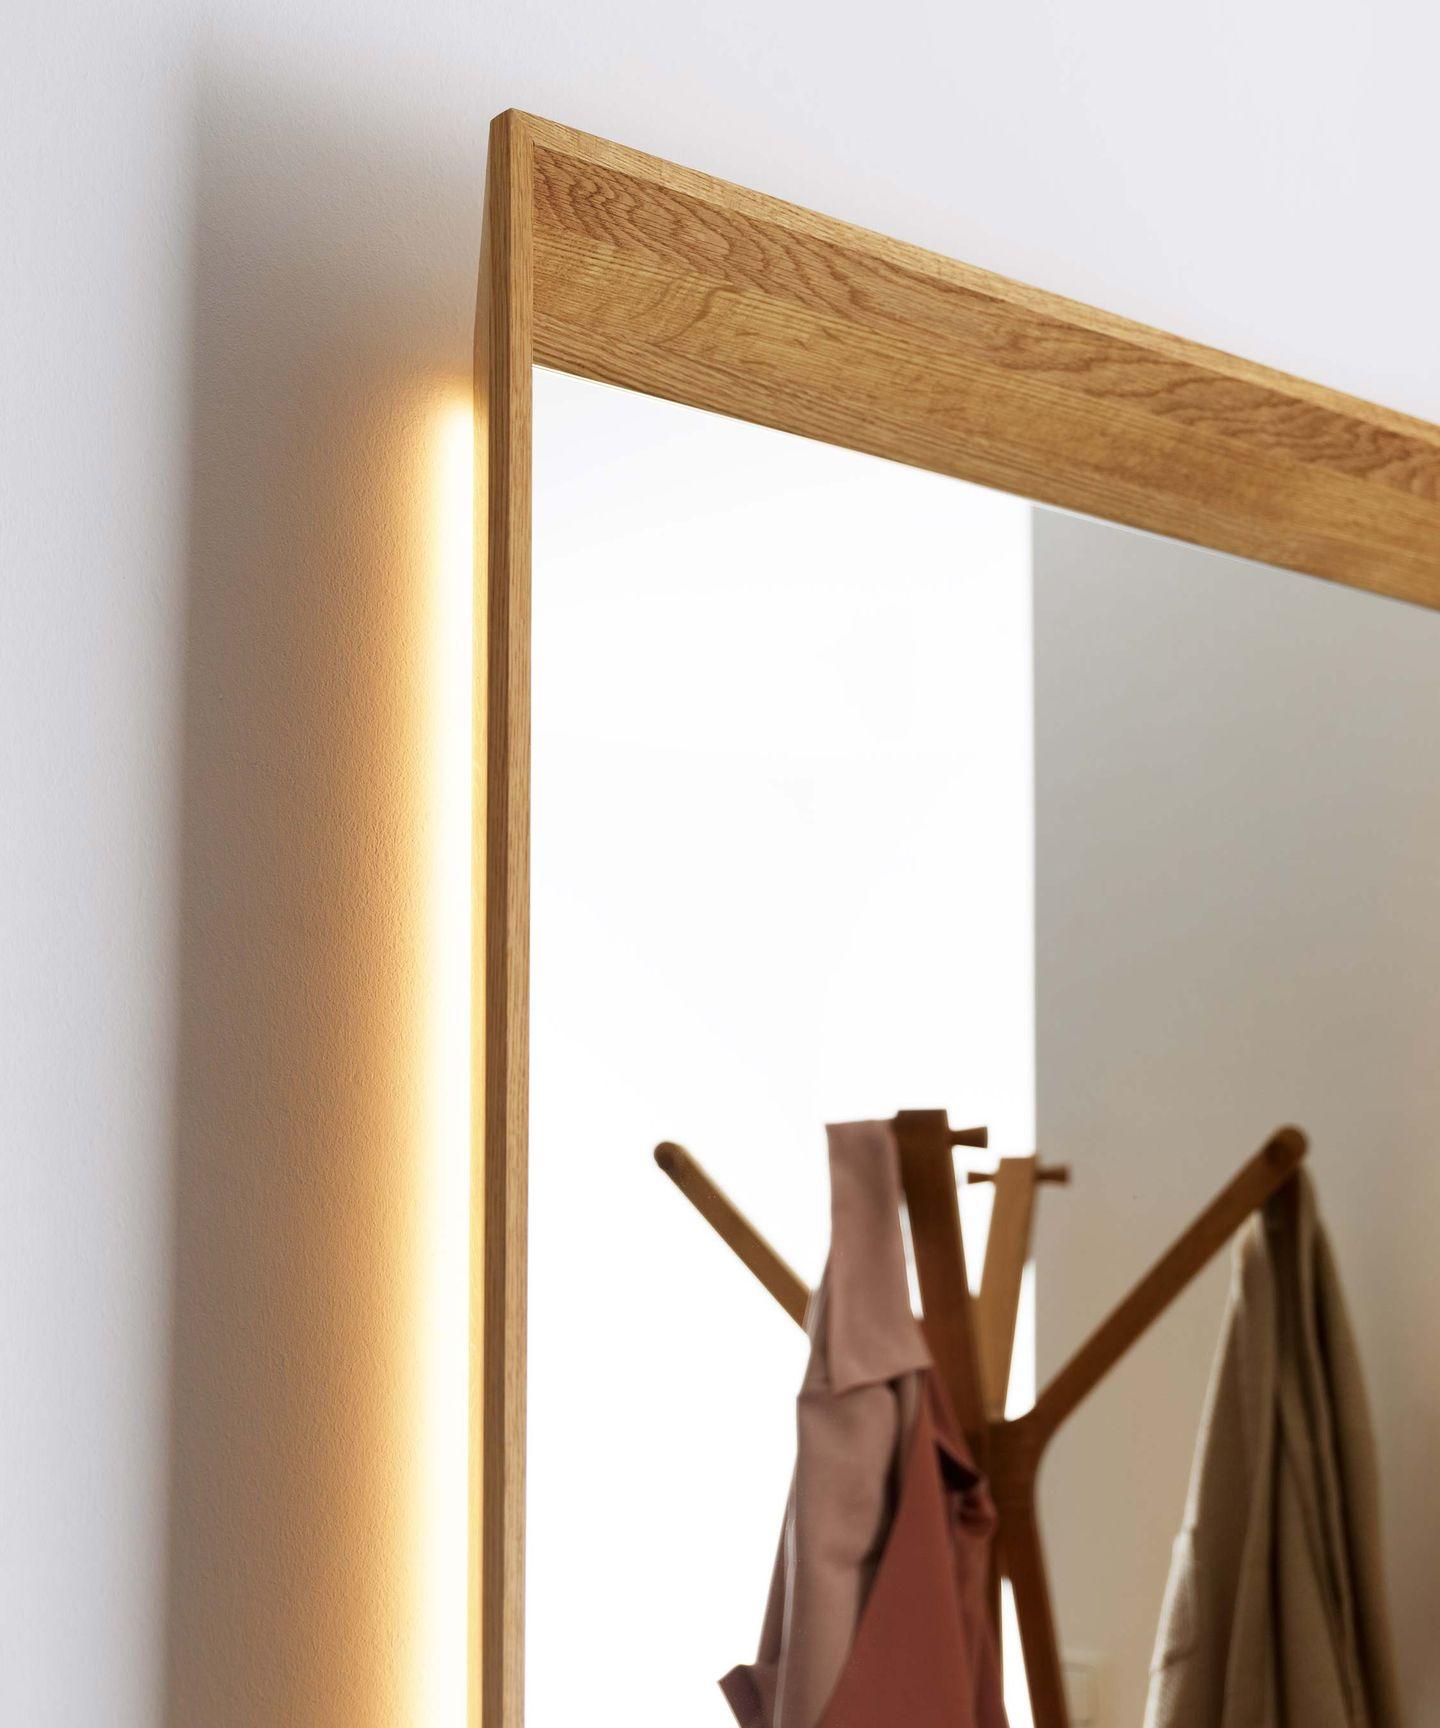 haiku mirror panel in oak with lighting